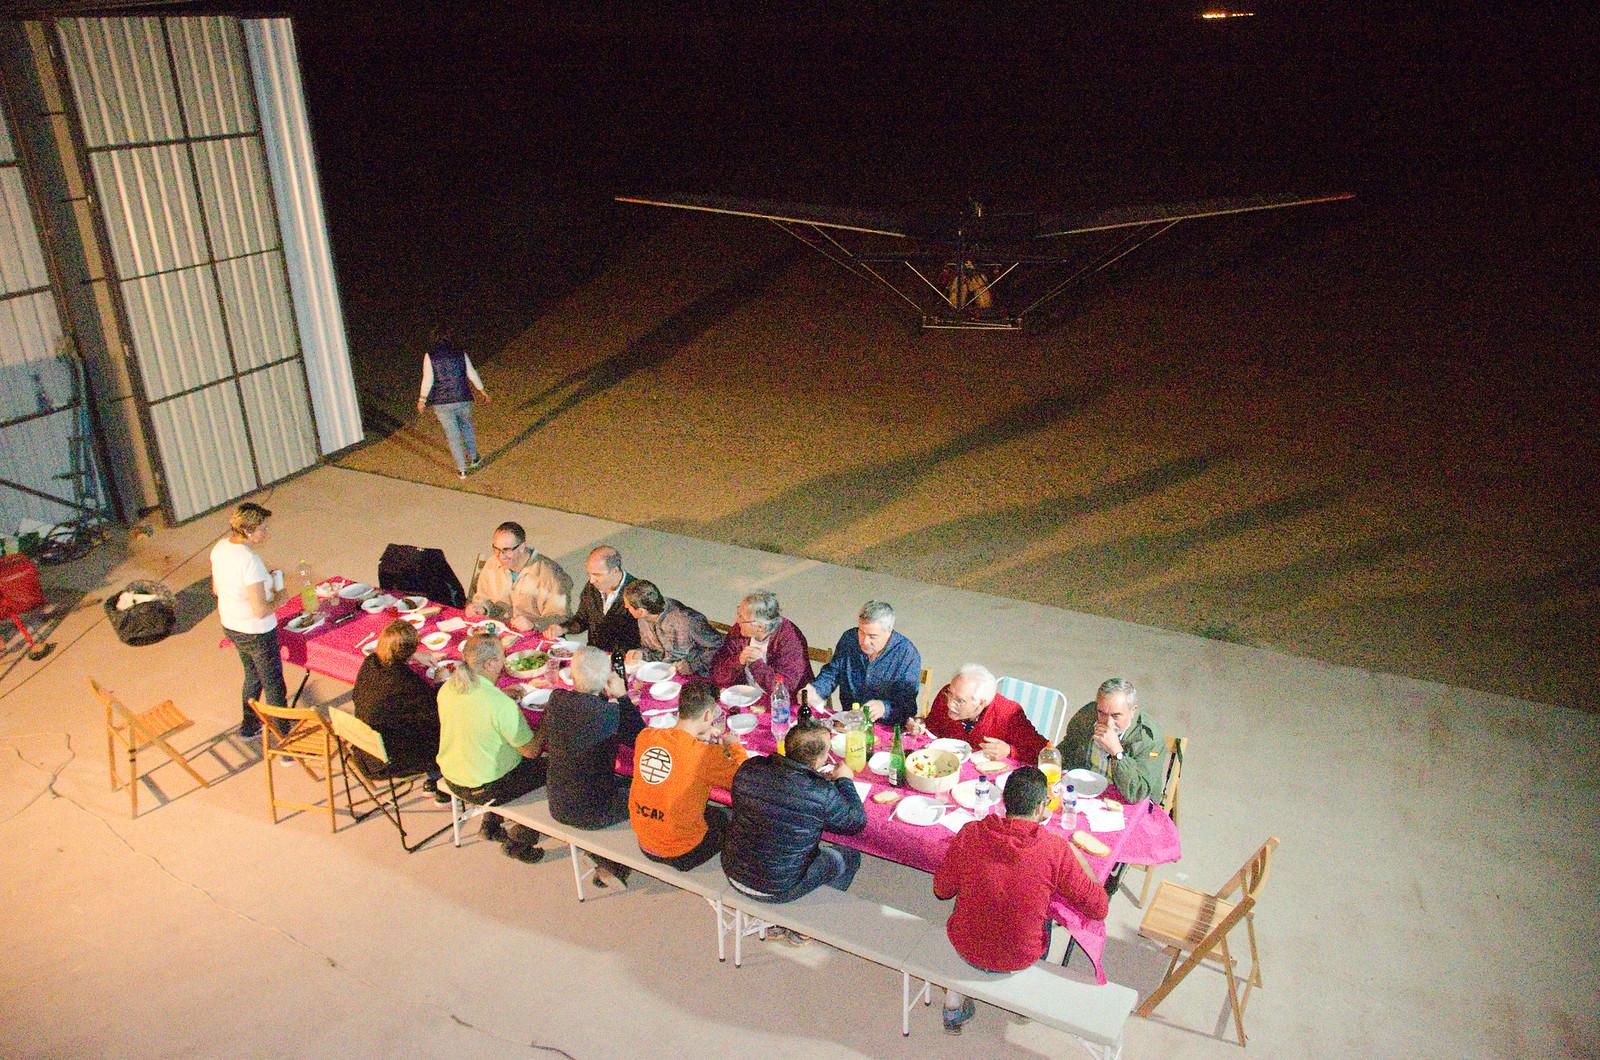 Cena Club Aerodromo Astorga Kitfox  hangar noche (25)